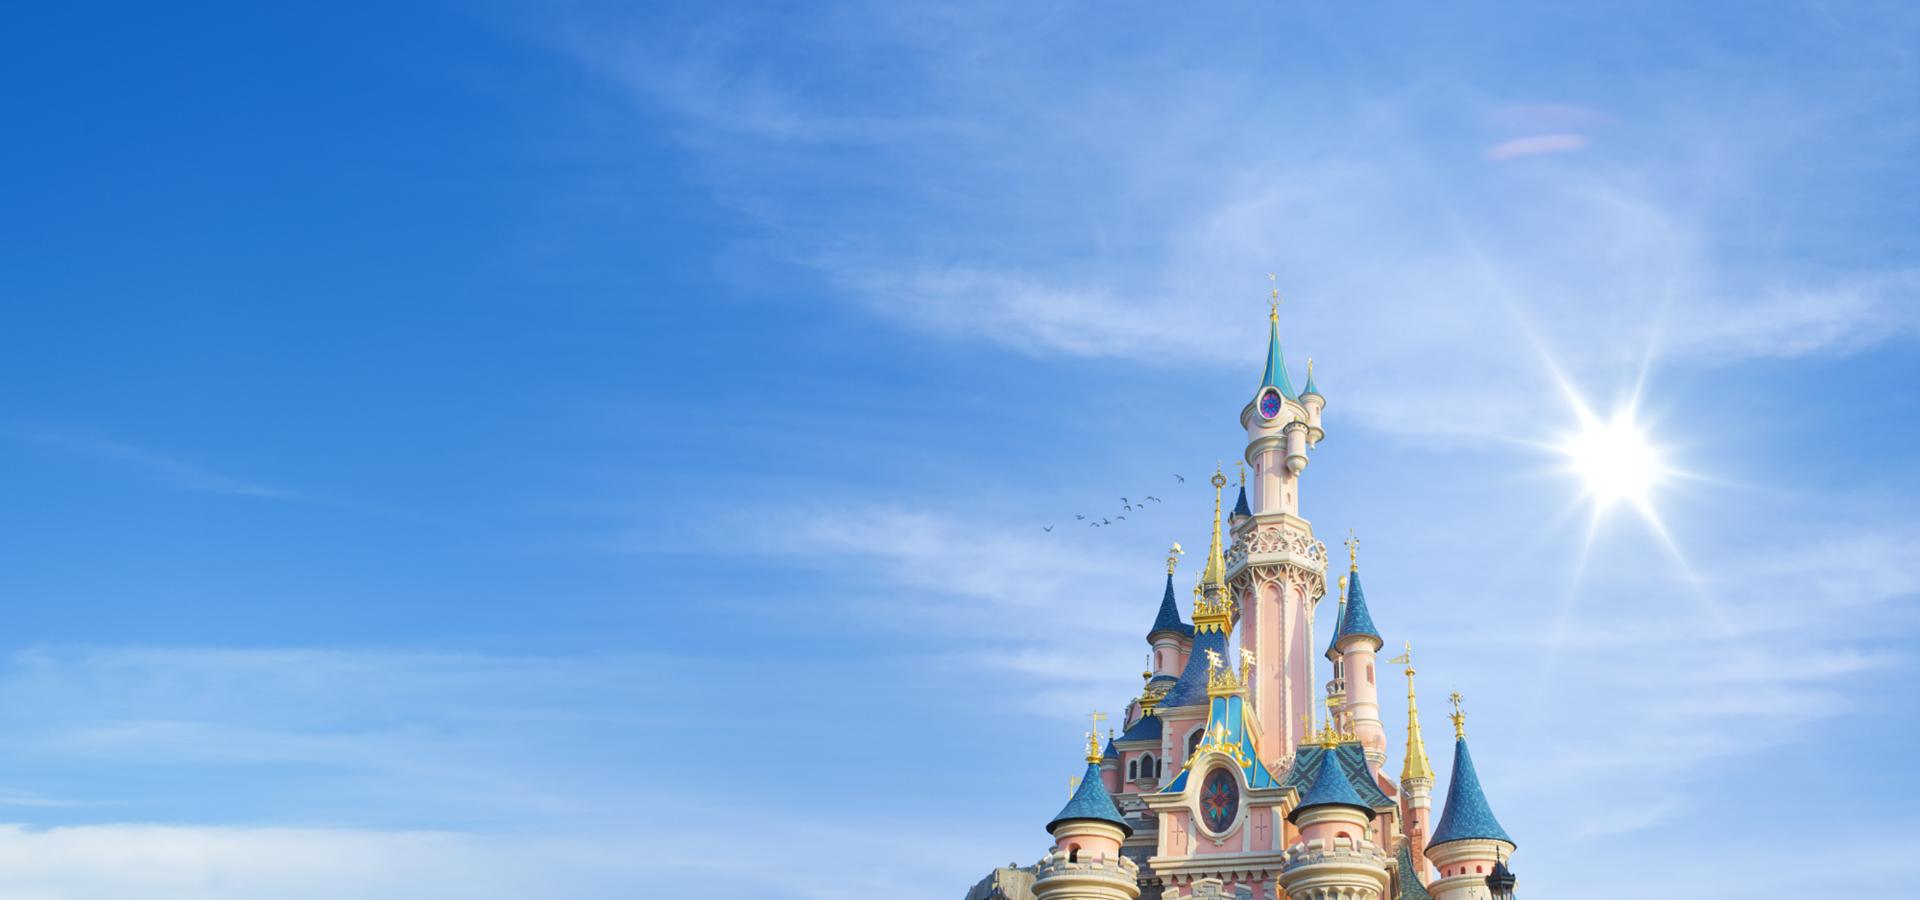 Disneyland Paris Holidays 2021 from Ireland EuroDisney